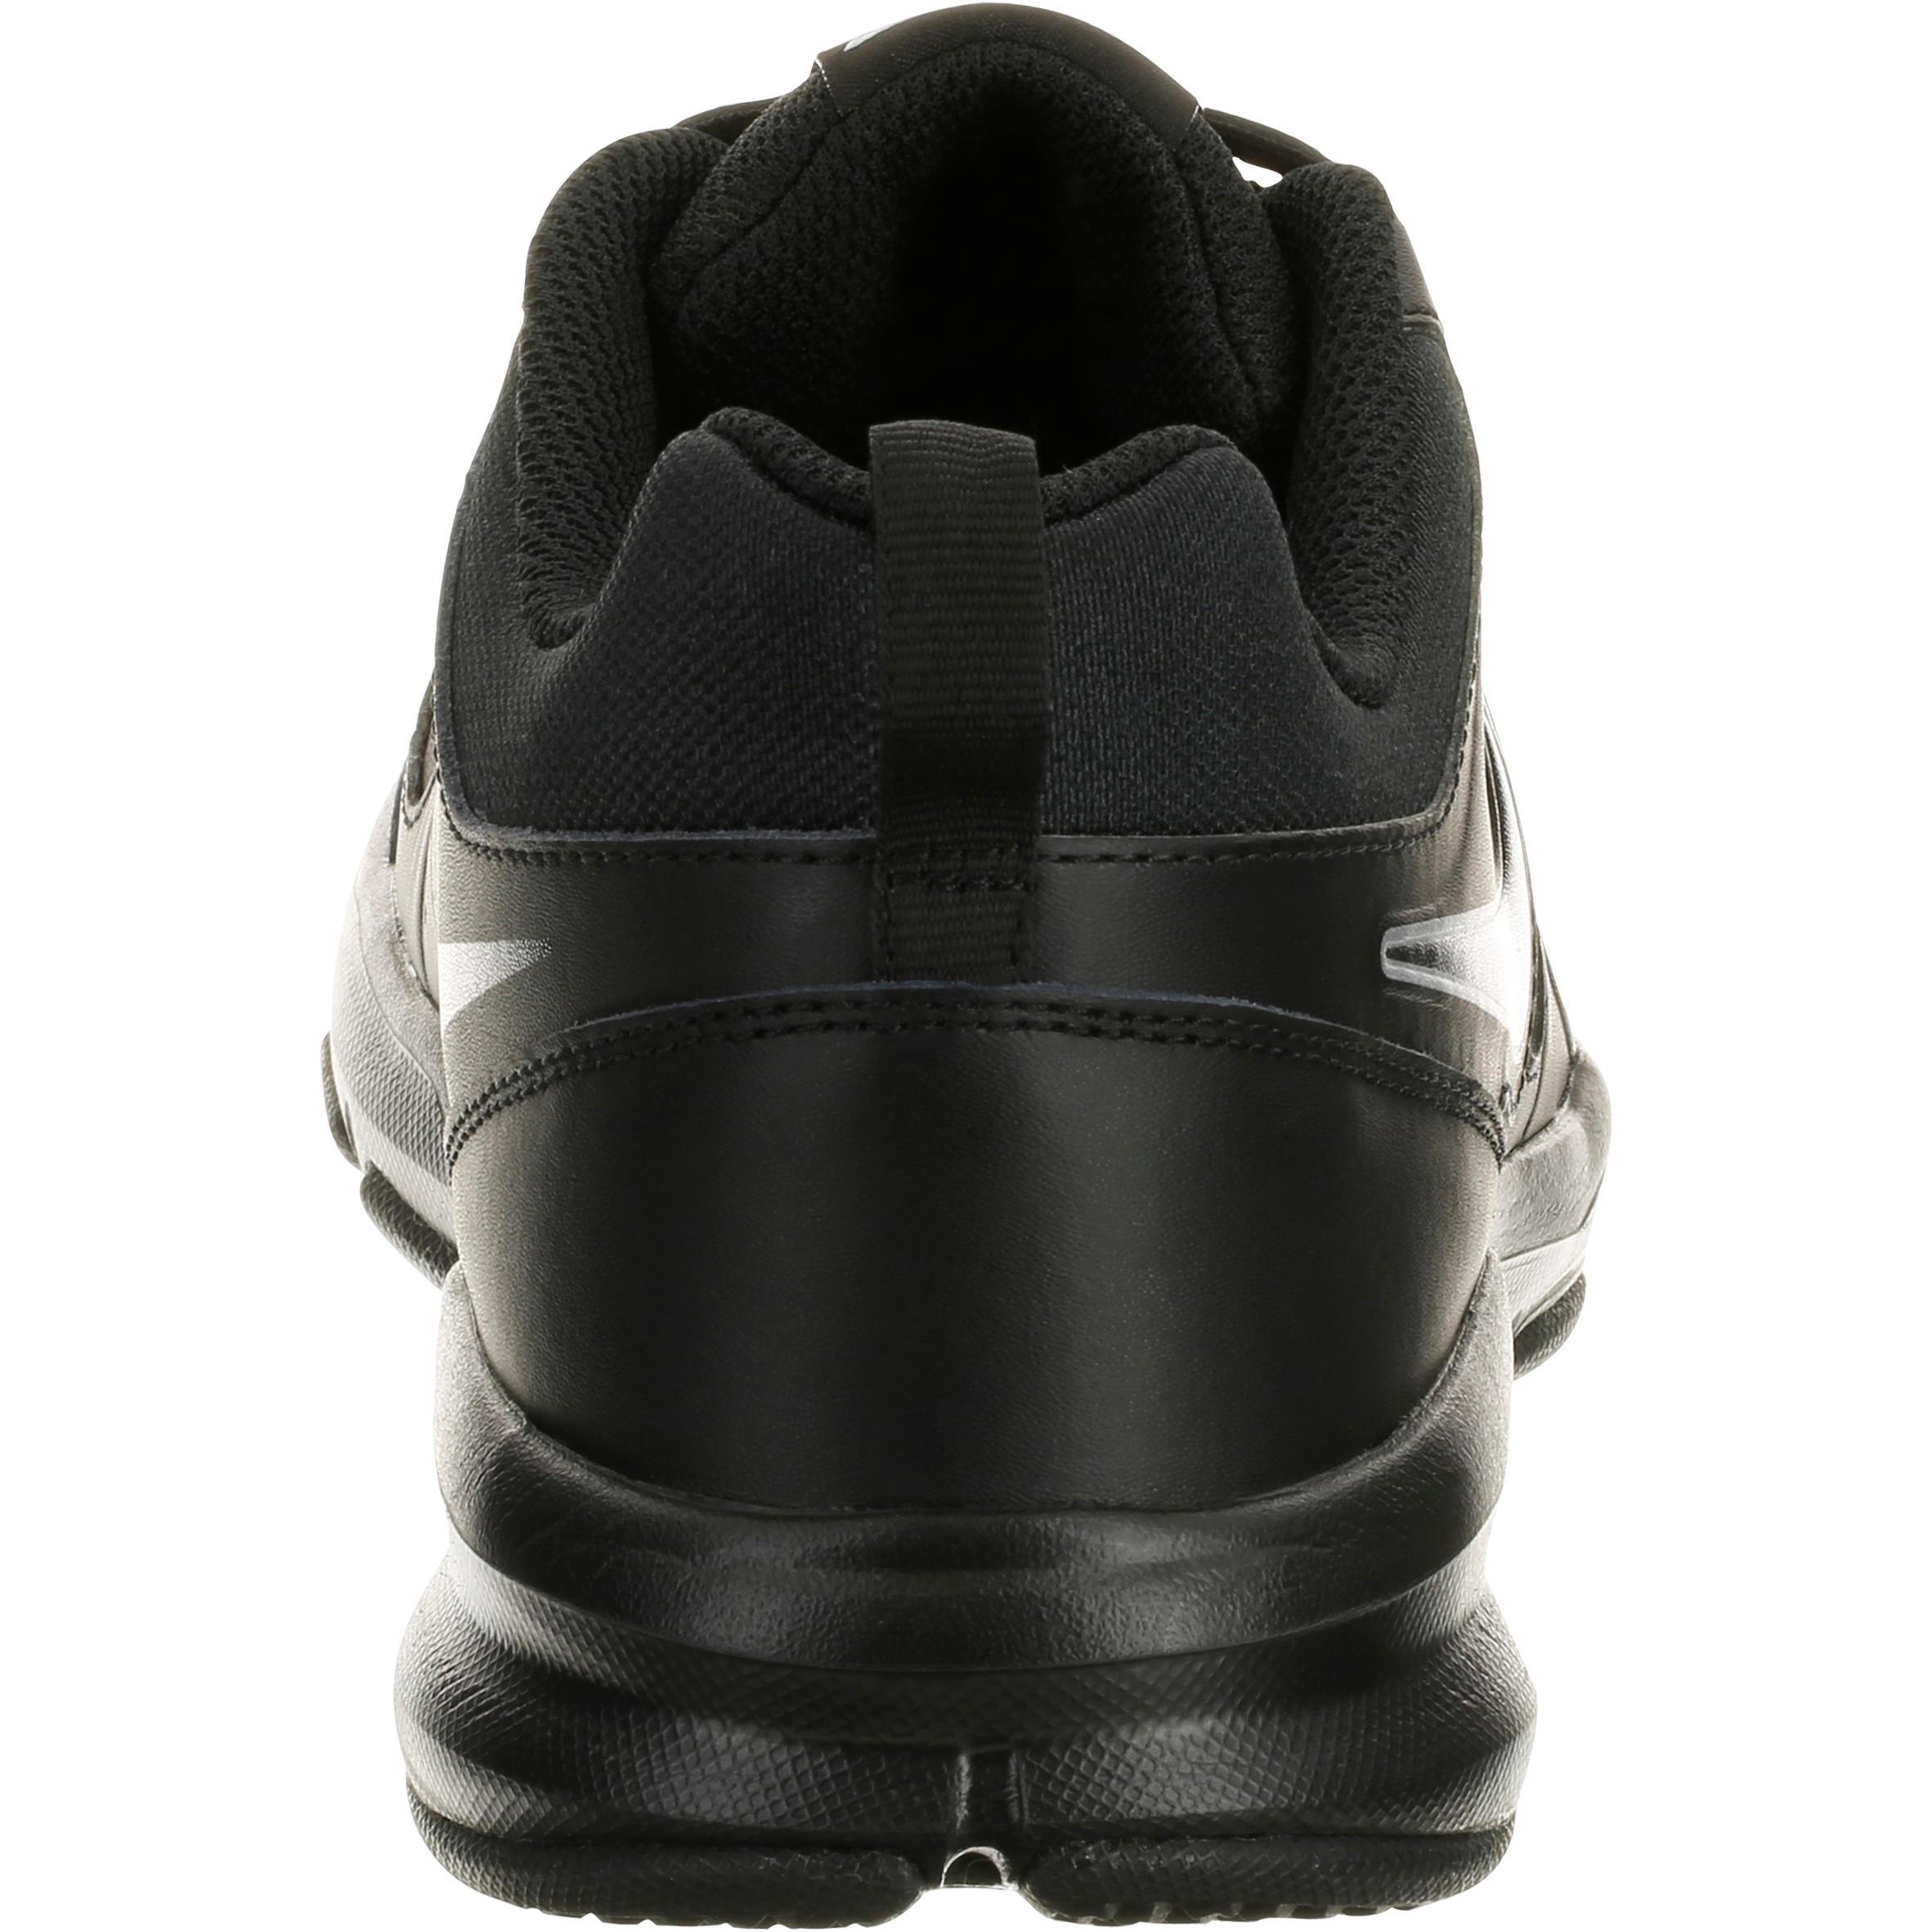 Sportive T Nike Chaussures Marche Homme Noir Lite dCxBeo